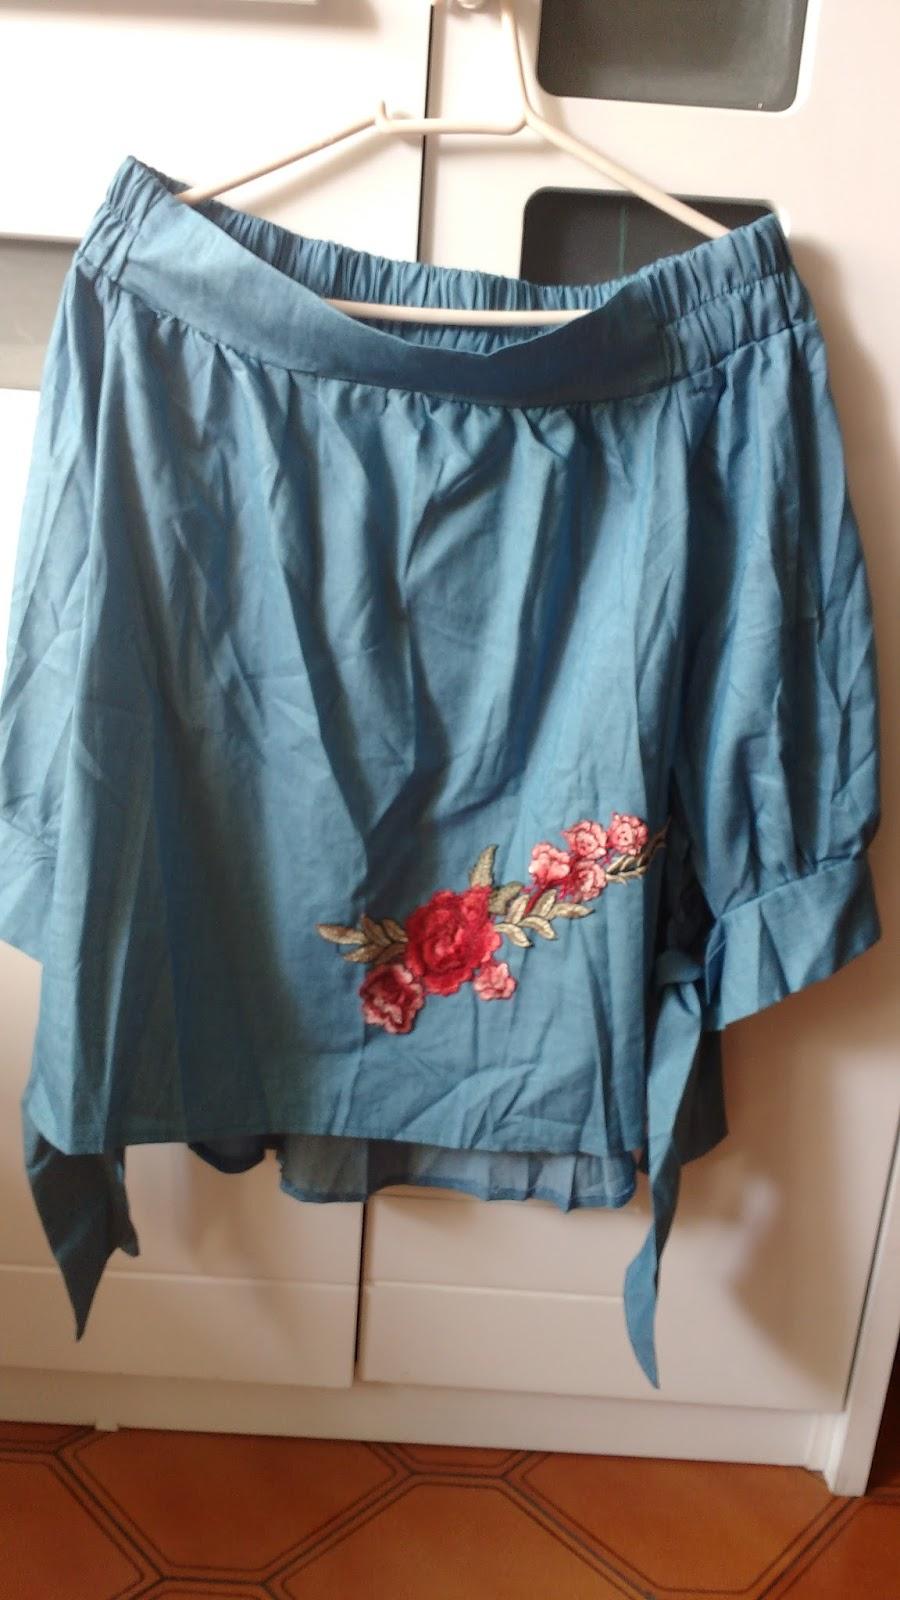 d7af41eec Recebidos Loja Rosegal, blusa jeans, blusa ombro a ombro